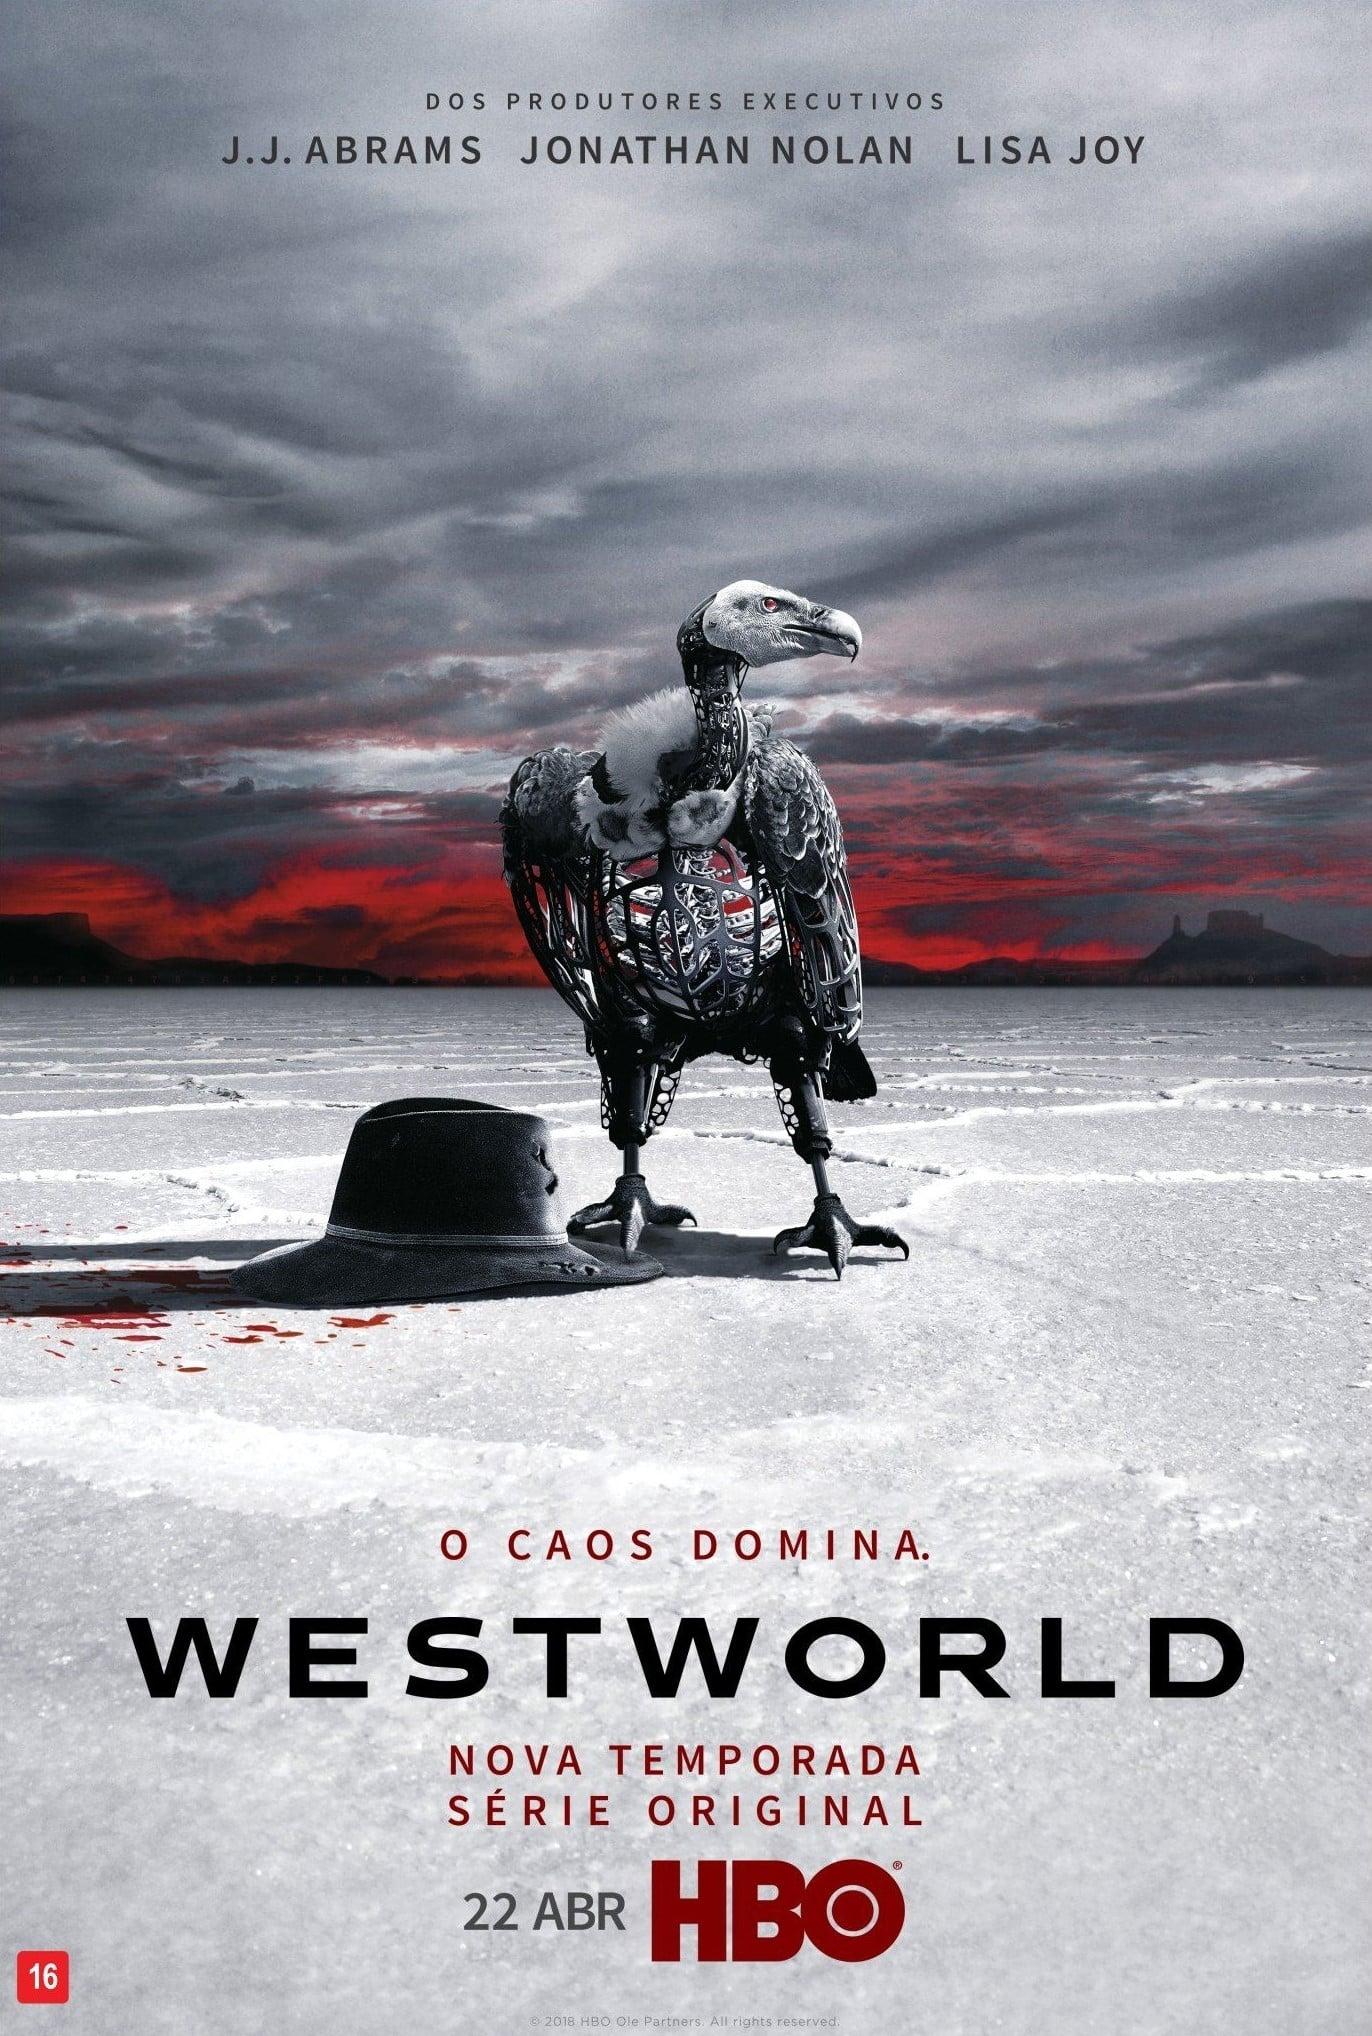 Westworld 2ª Temporada poster, capa, cartaz